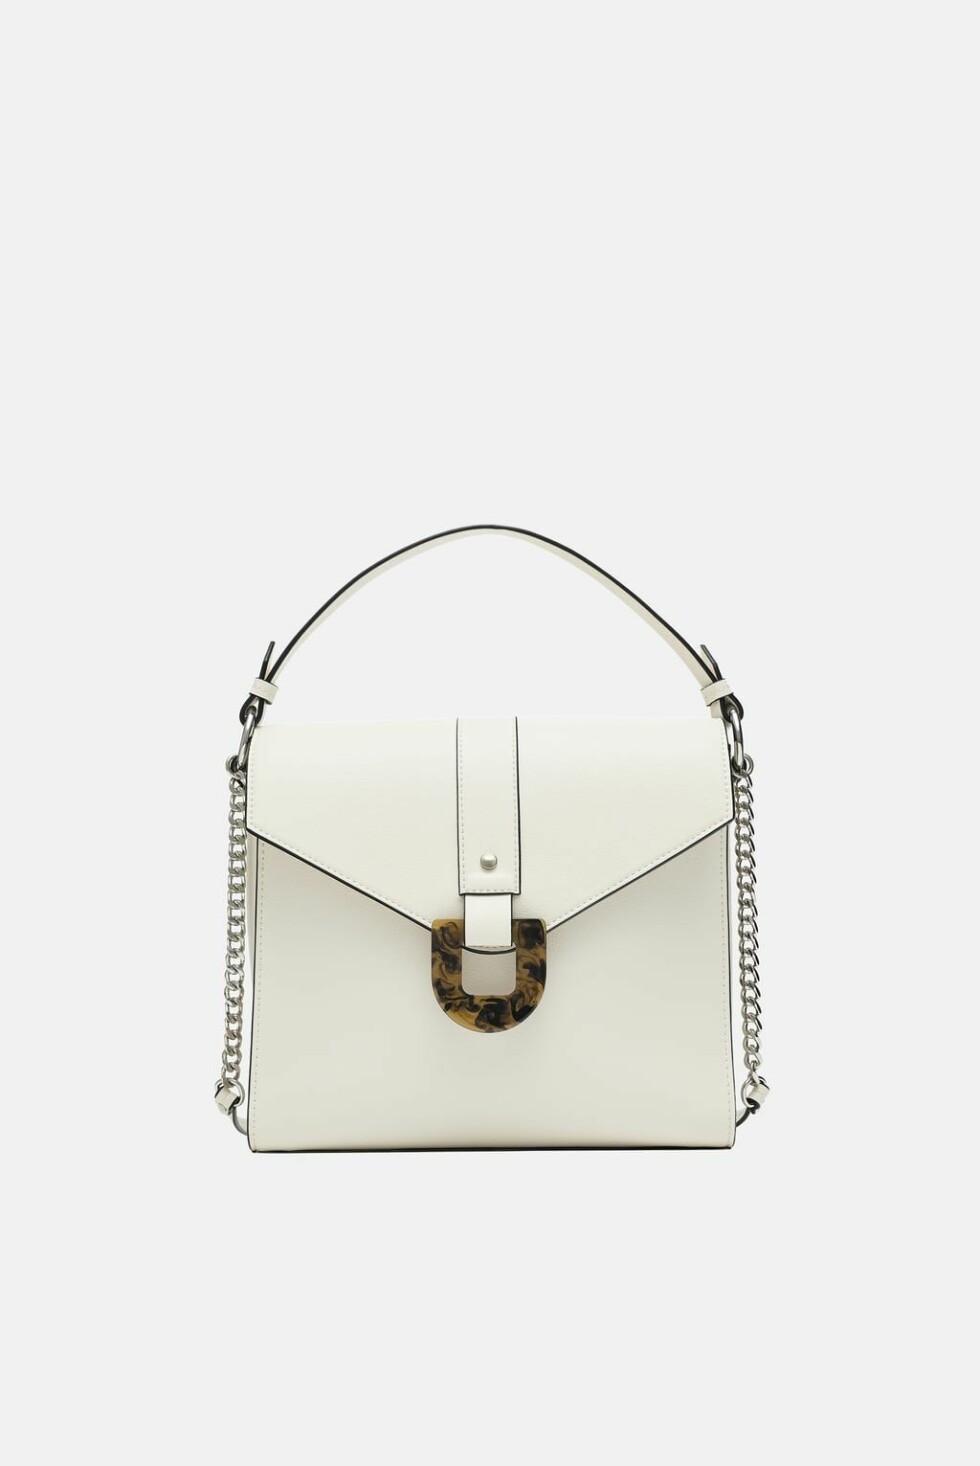 Veske fra Zara |199,-| https://www.zara.com/no/no/poseveske-med-skilpaddem%C3%B8nstret-detalj-p17355304.html?v1=6778054&v2=1074708